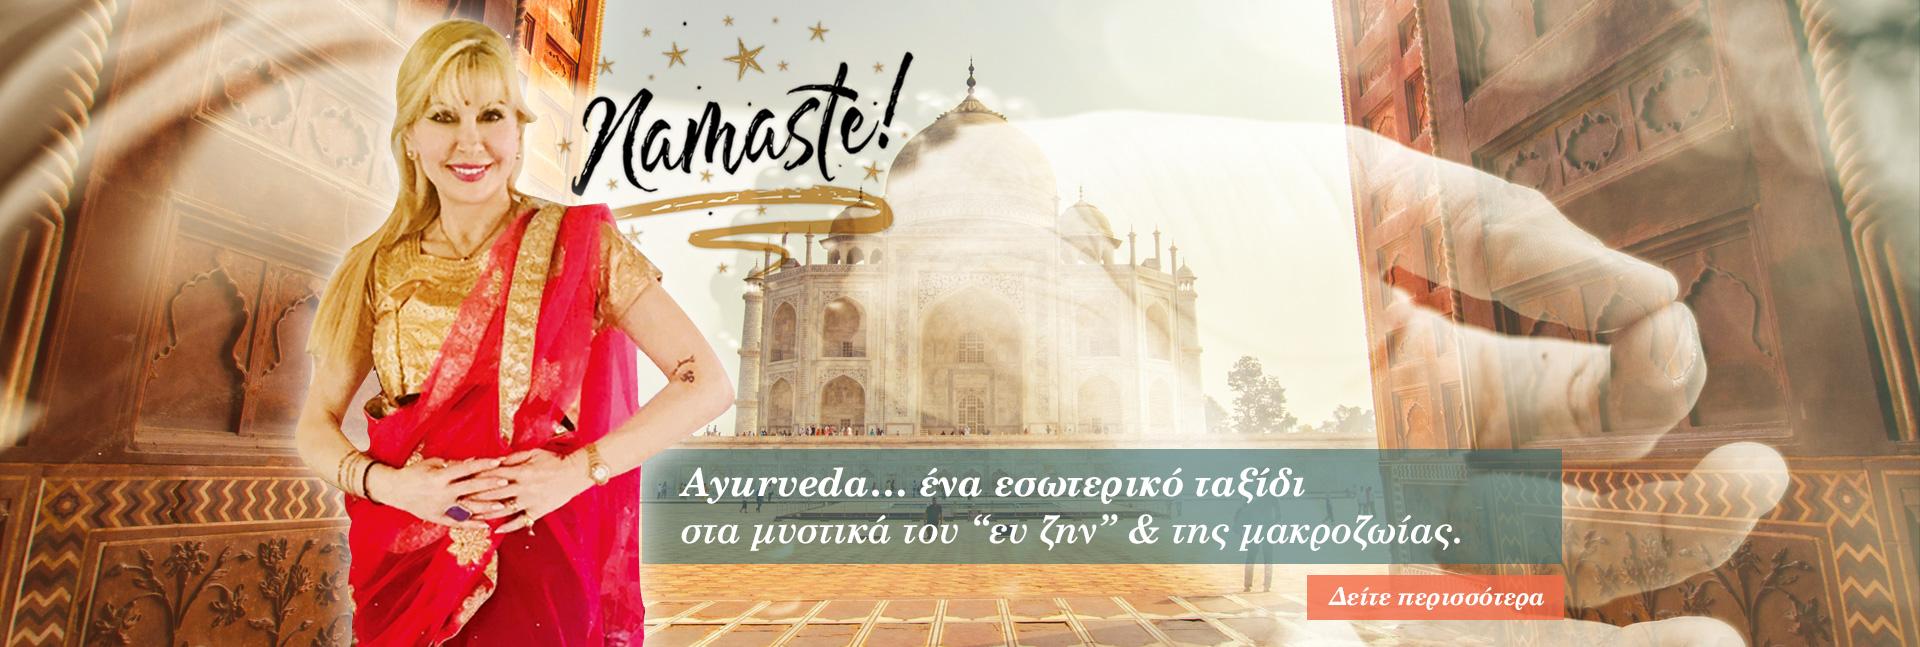 Namaste | Ayurveda Hellas